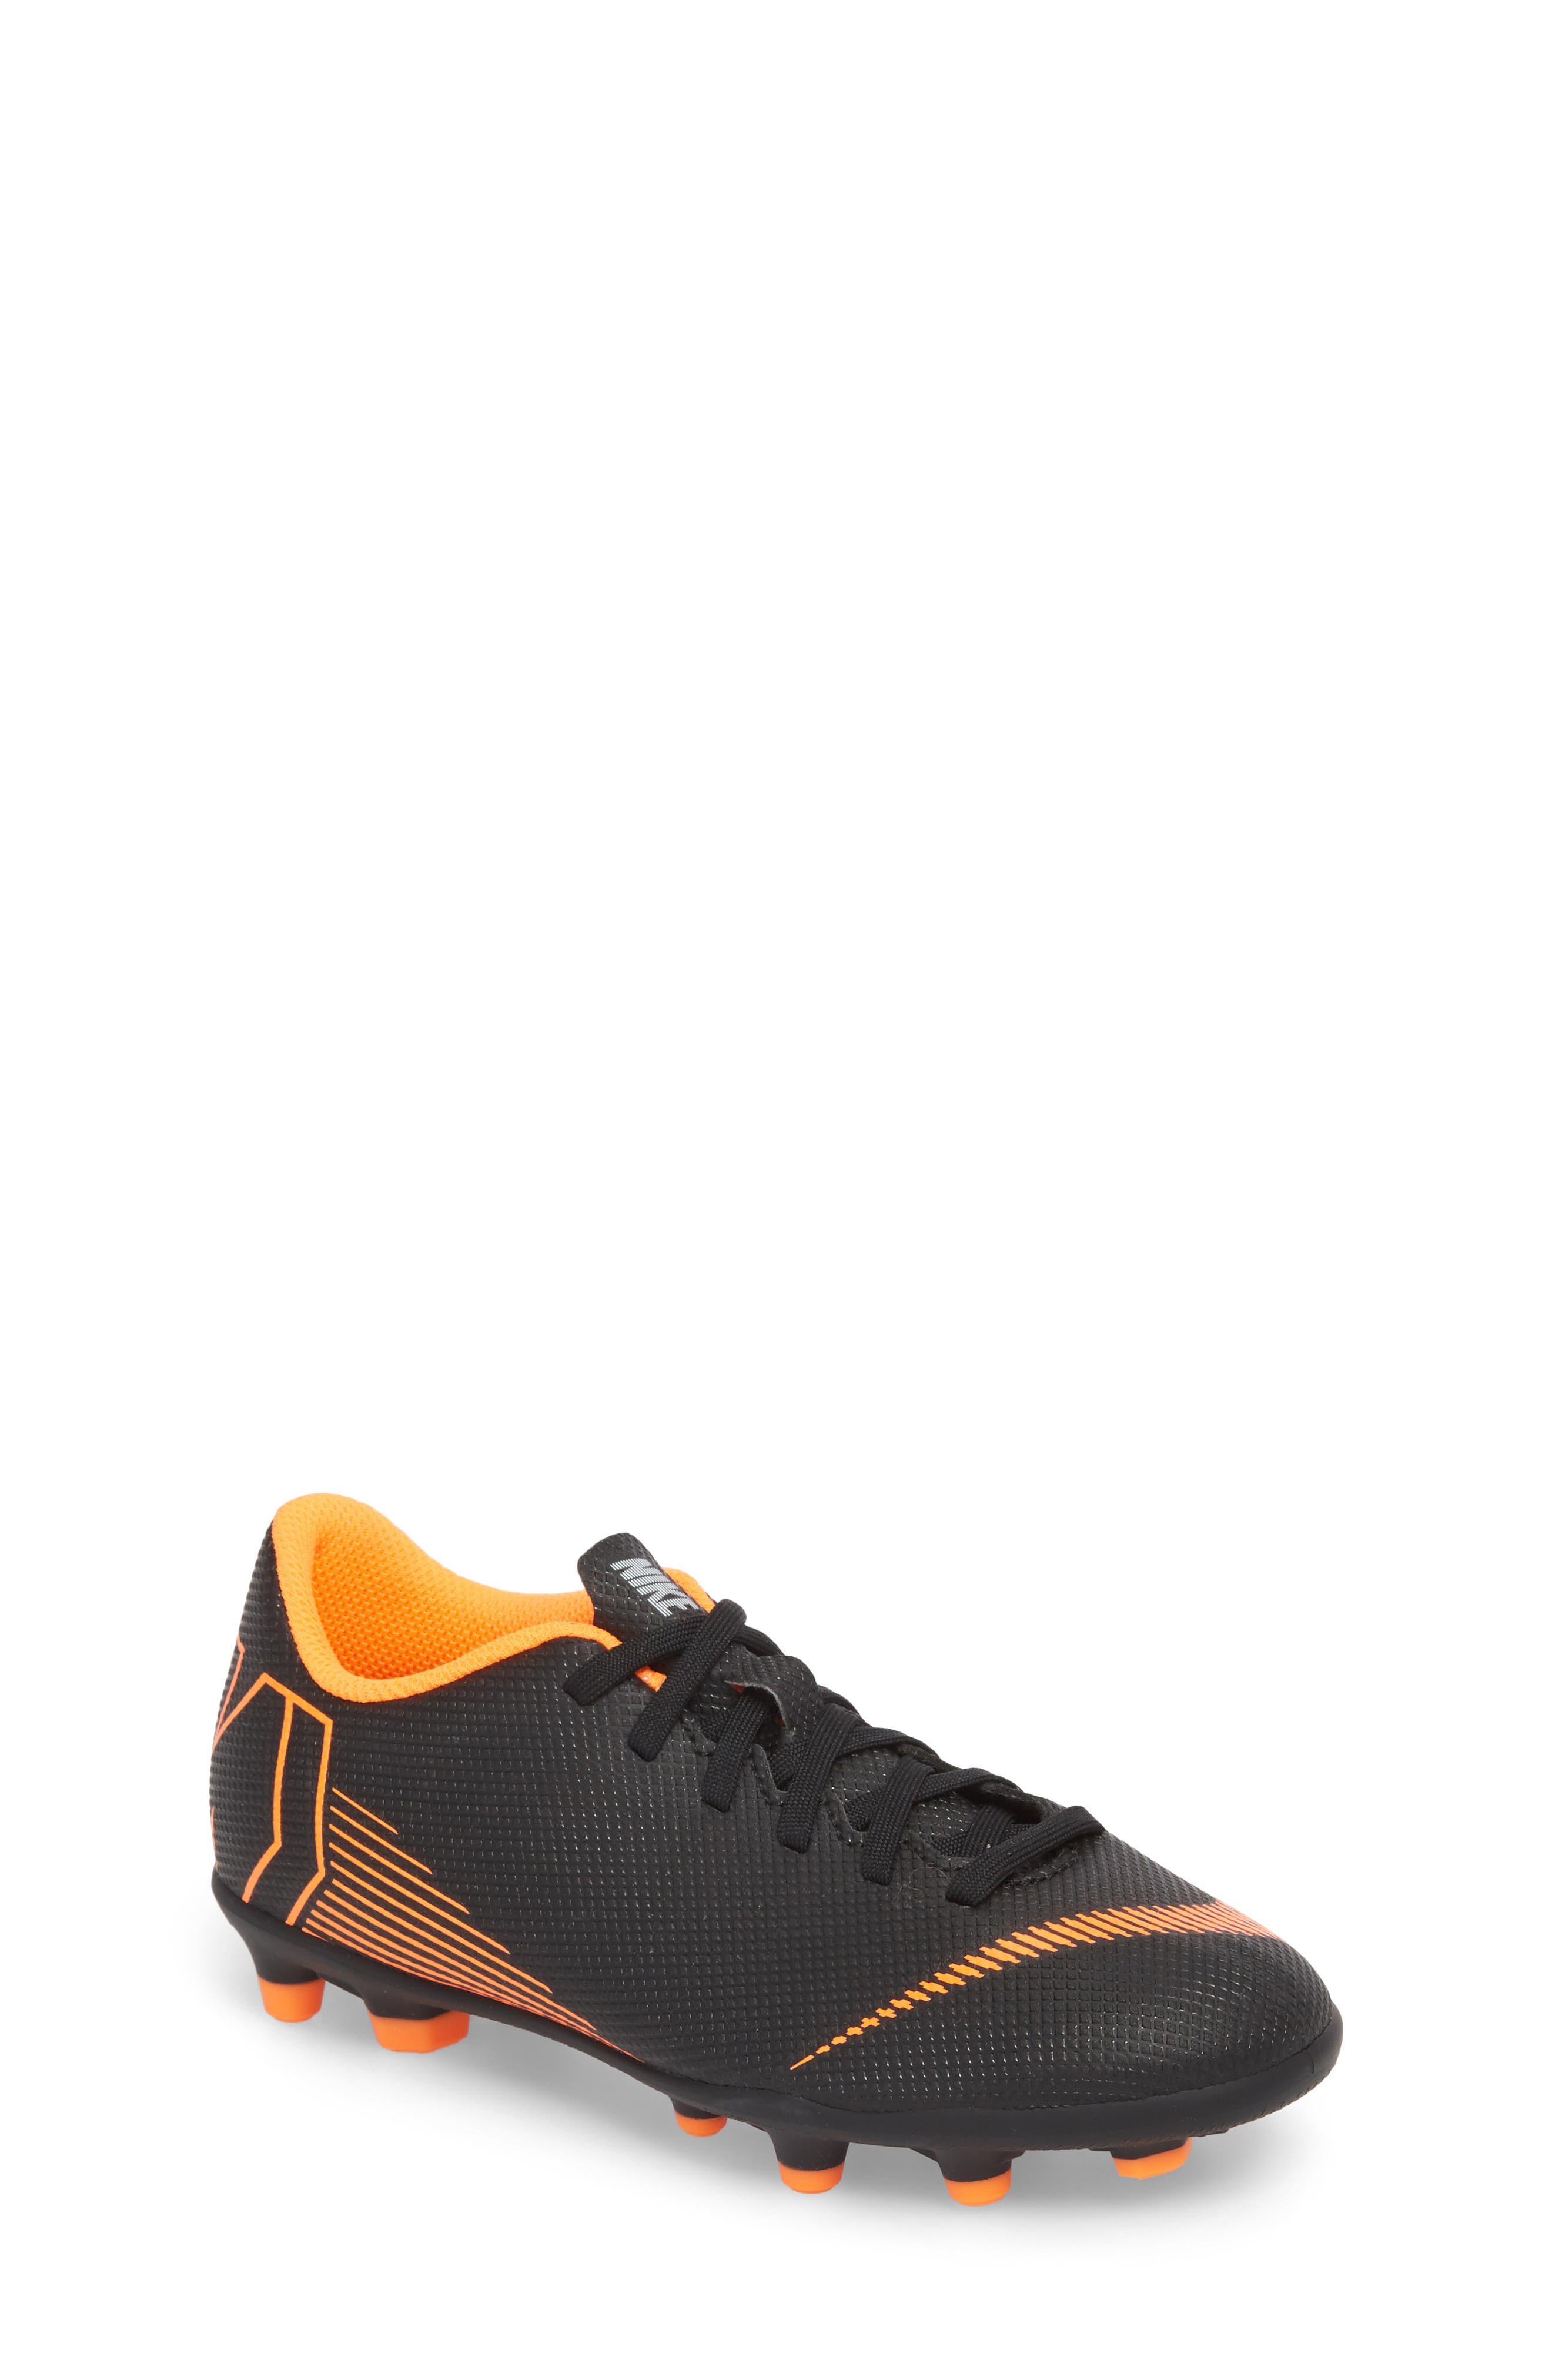 Vapor XII Club Multi Ground Soccer Shoe,                             Main thumbnail 1, color,                             004